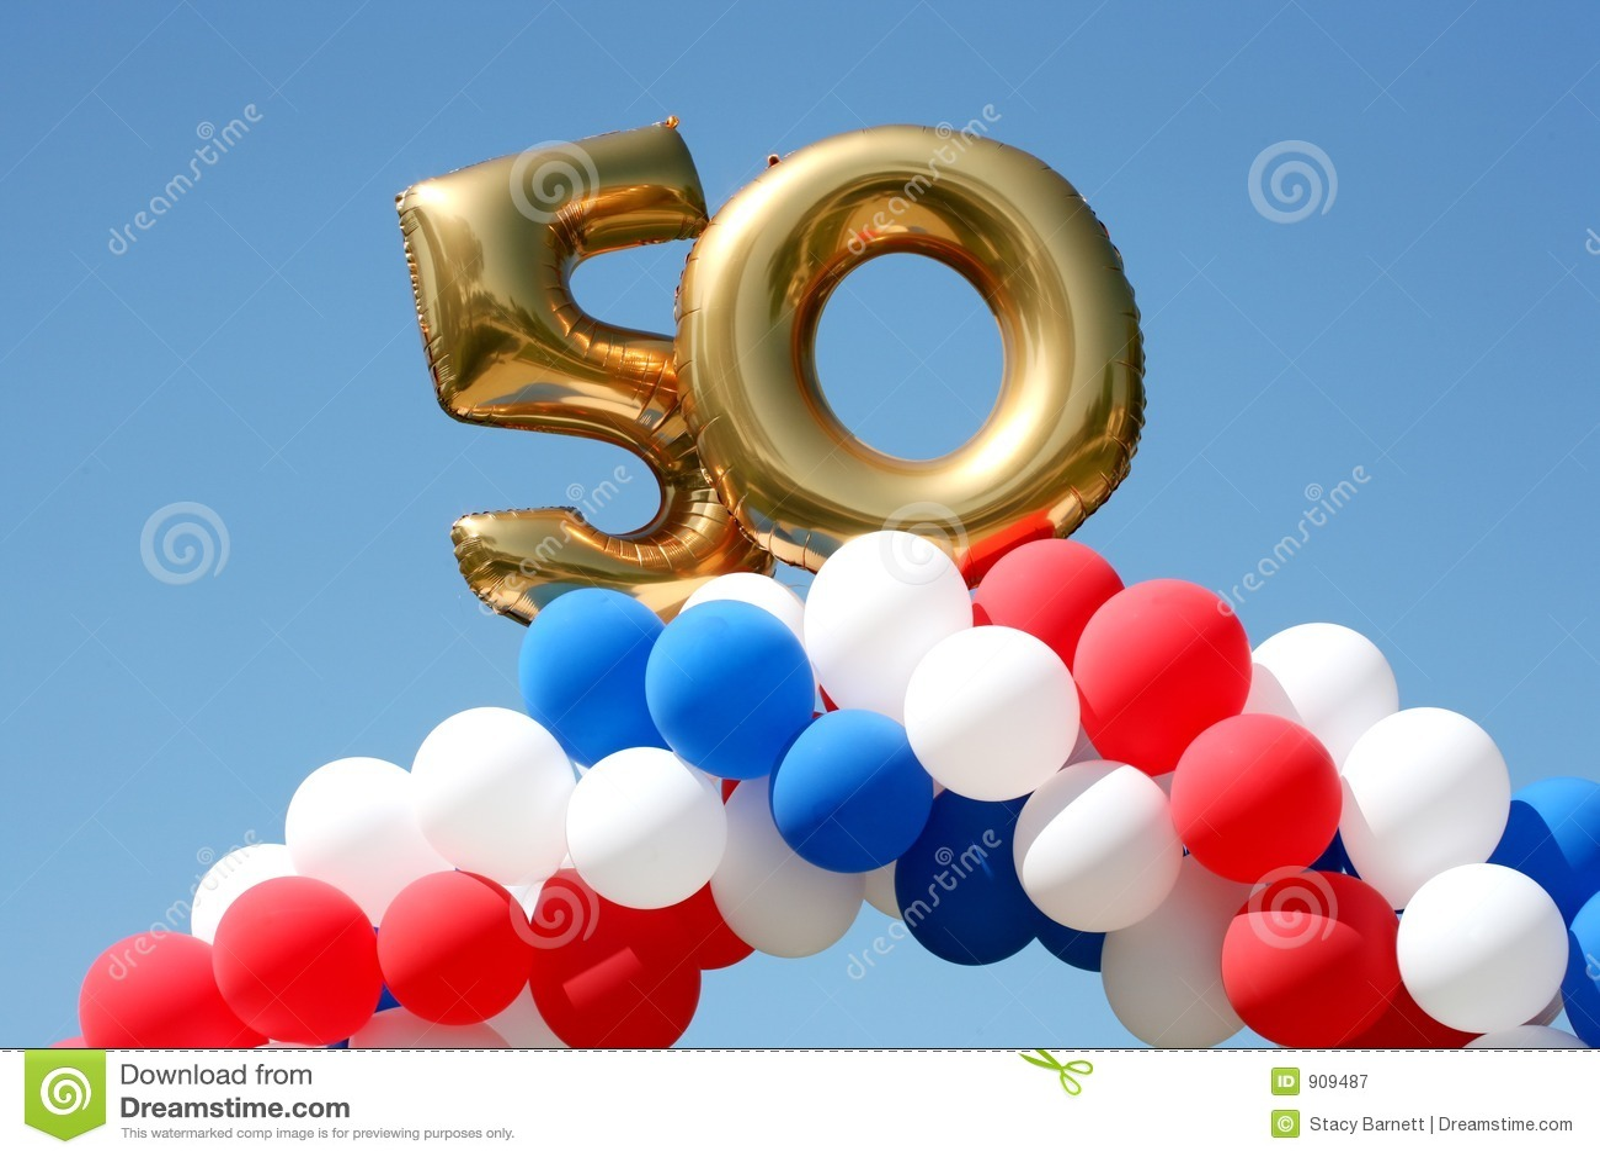 50 Year Celebration Balloons Royalty Free Stock